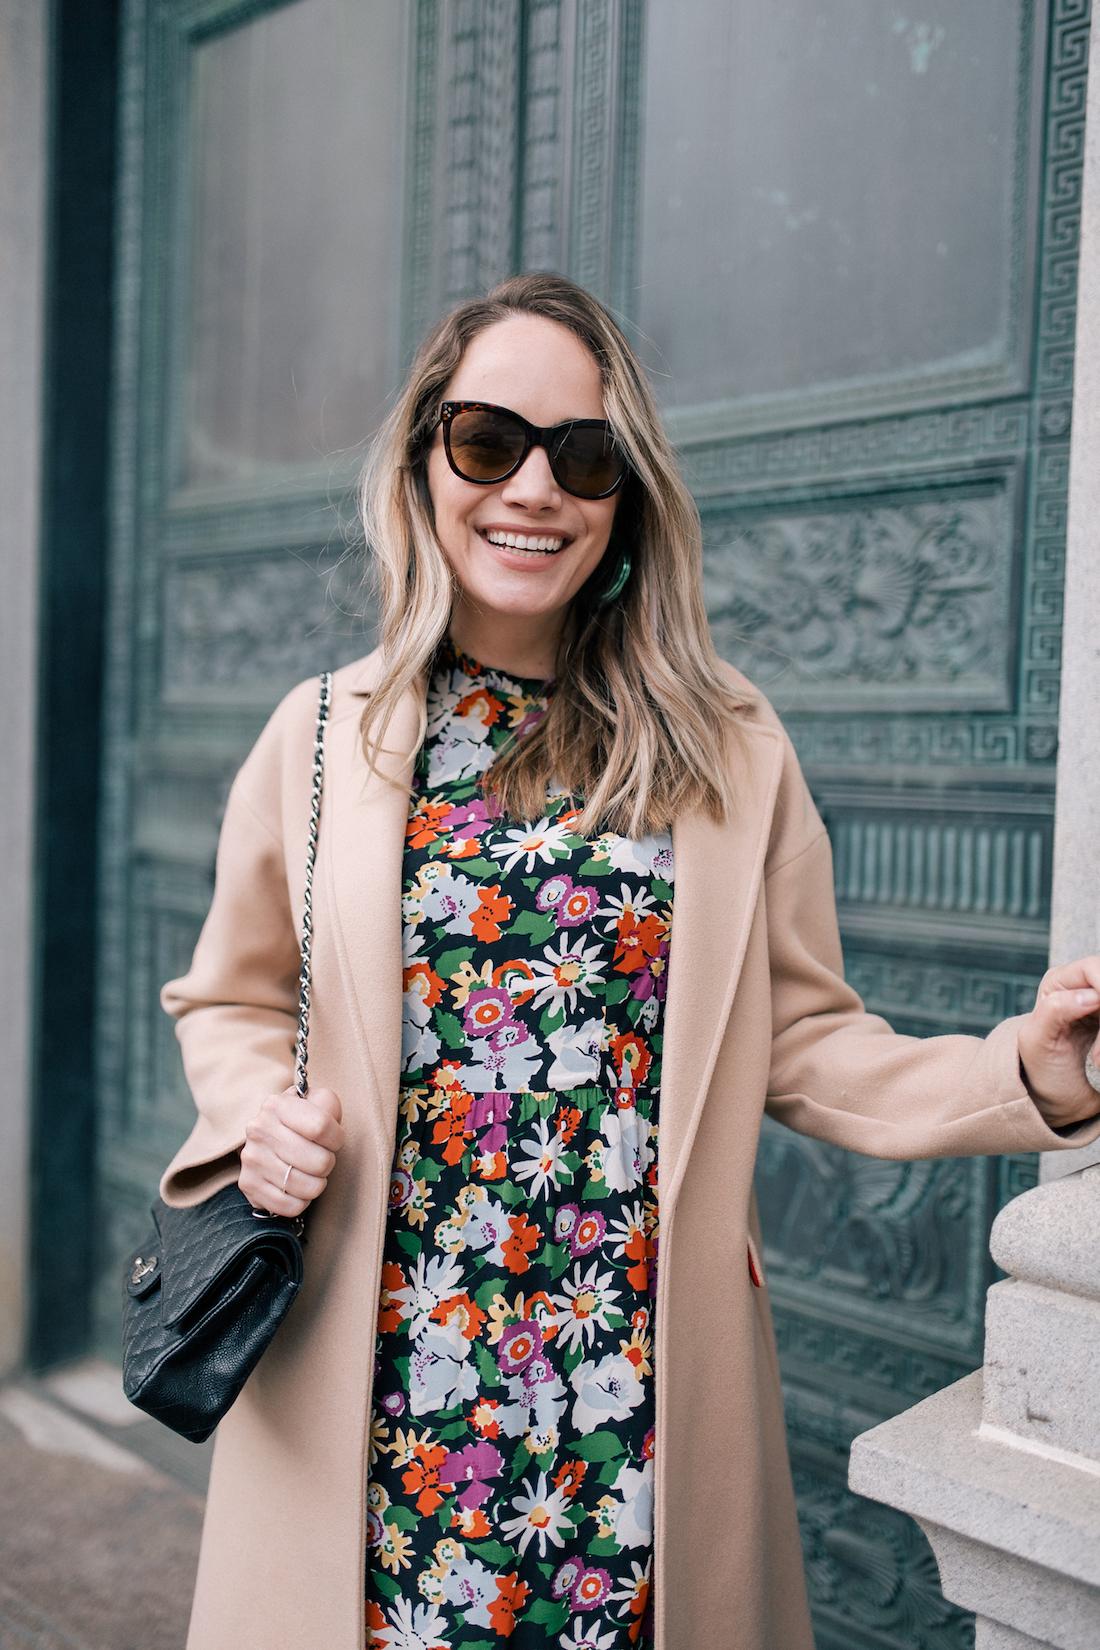 Outfit Details:Topshop Coat // L. K. Bennett Dress  // BaubleBar Green Lucite Hoops // Chanel Bag // Polaroid Sunglasses